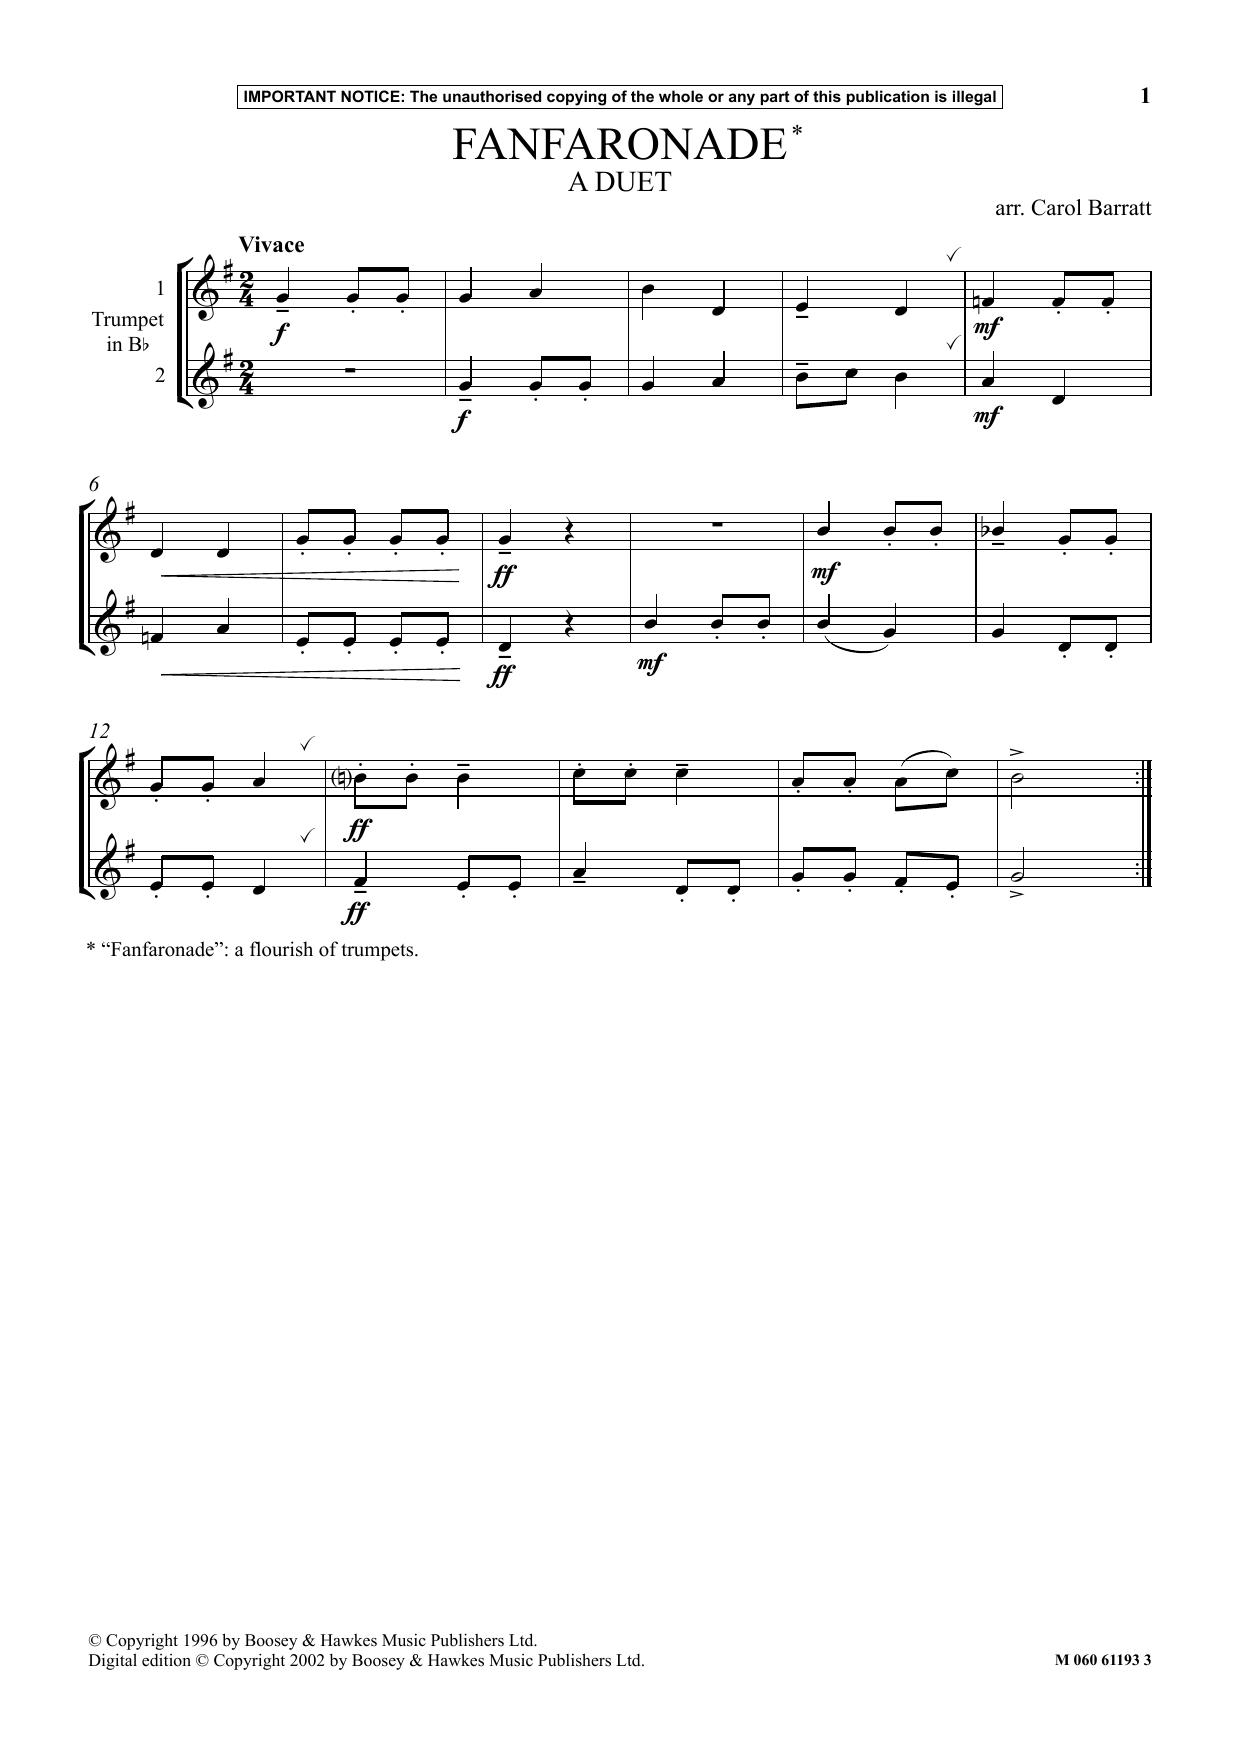 Fanfaronade Sheet Music